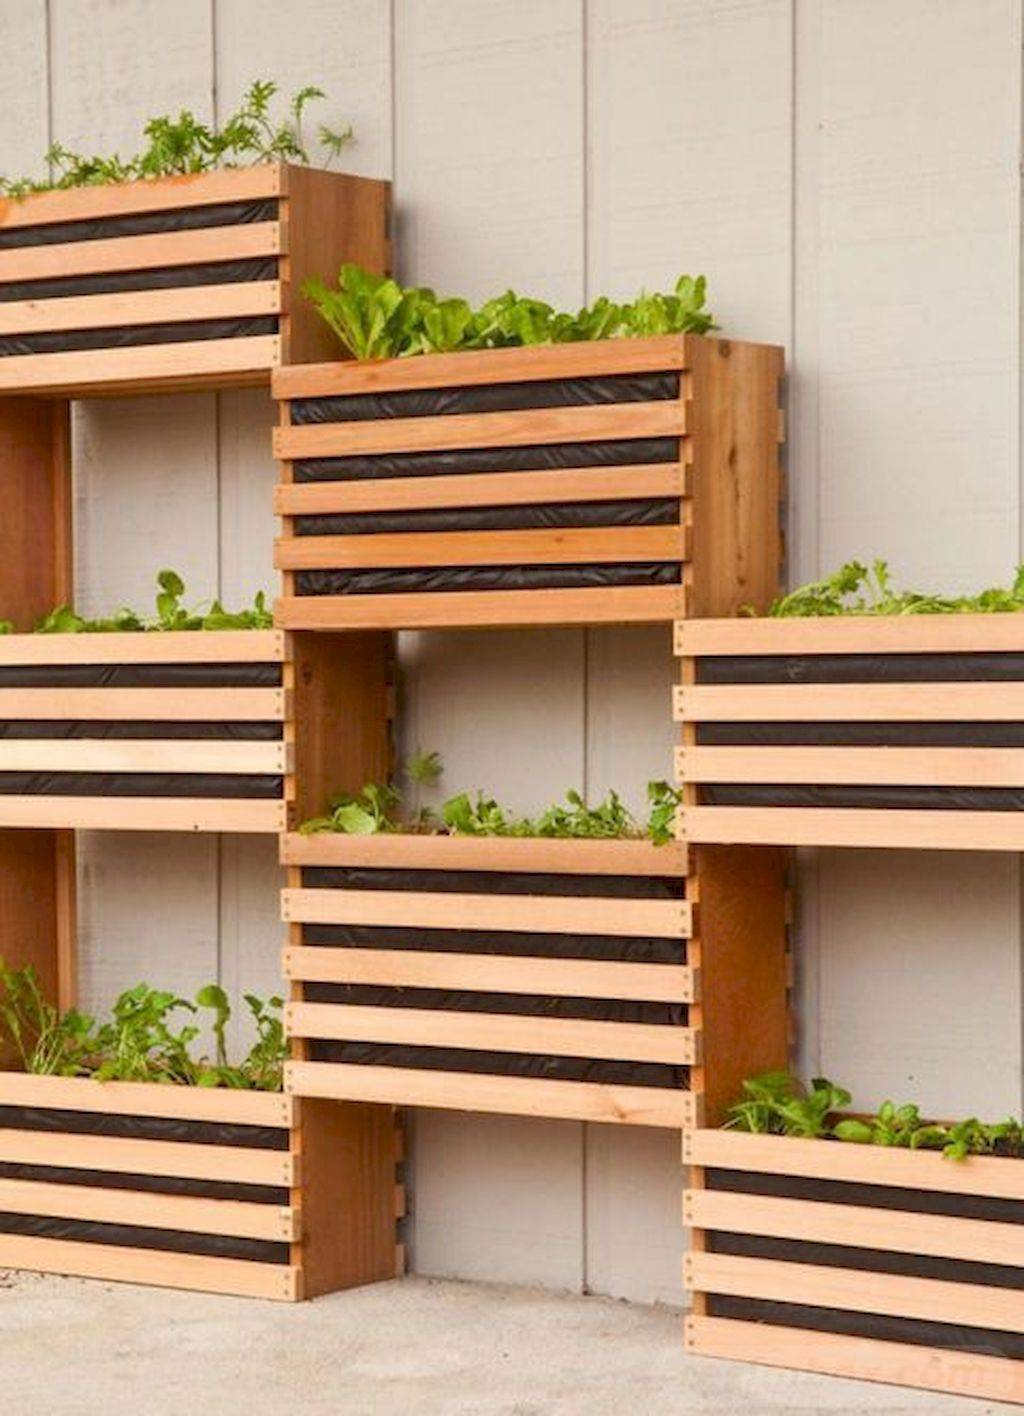 amazing garden ideas-742531057293235640